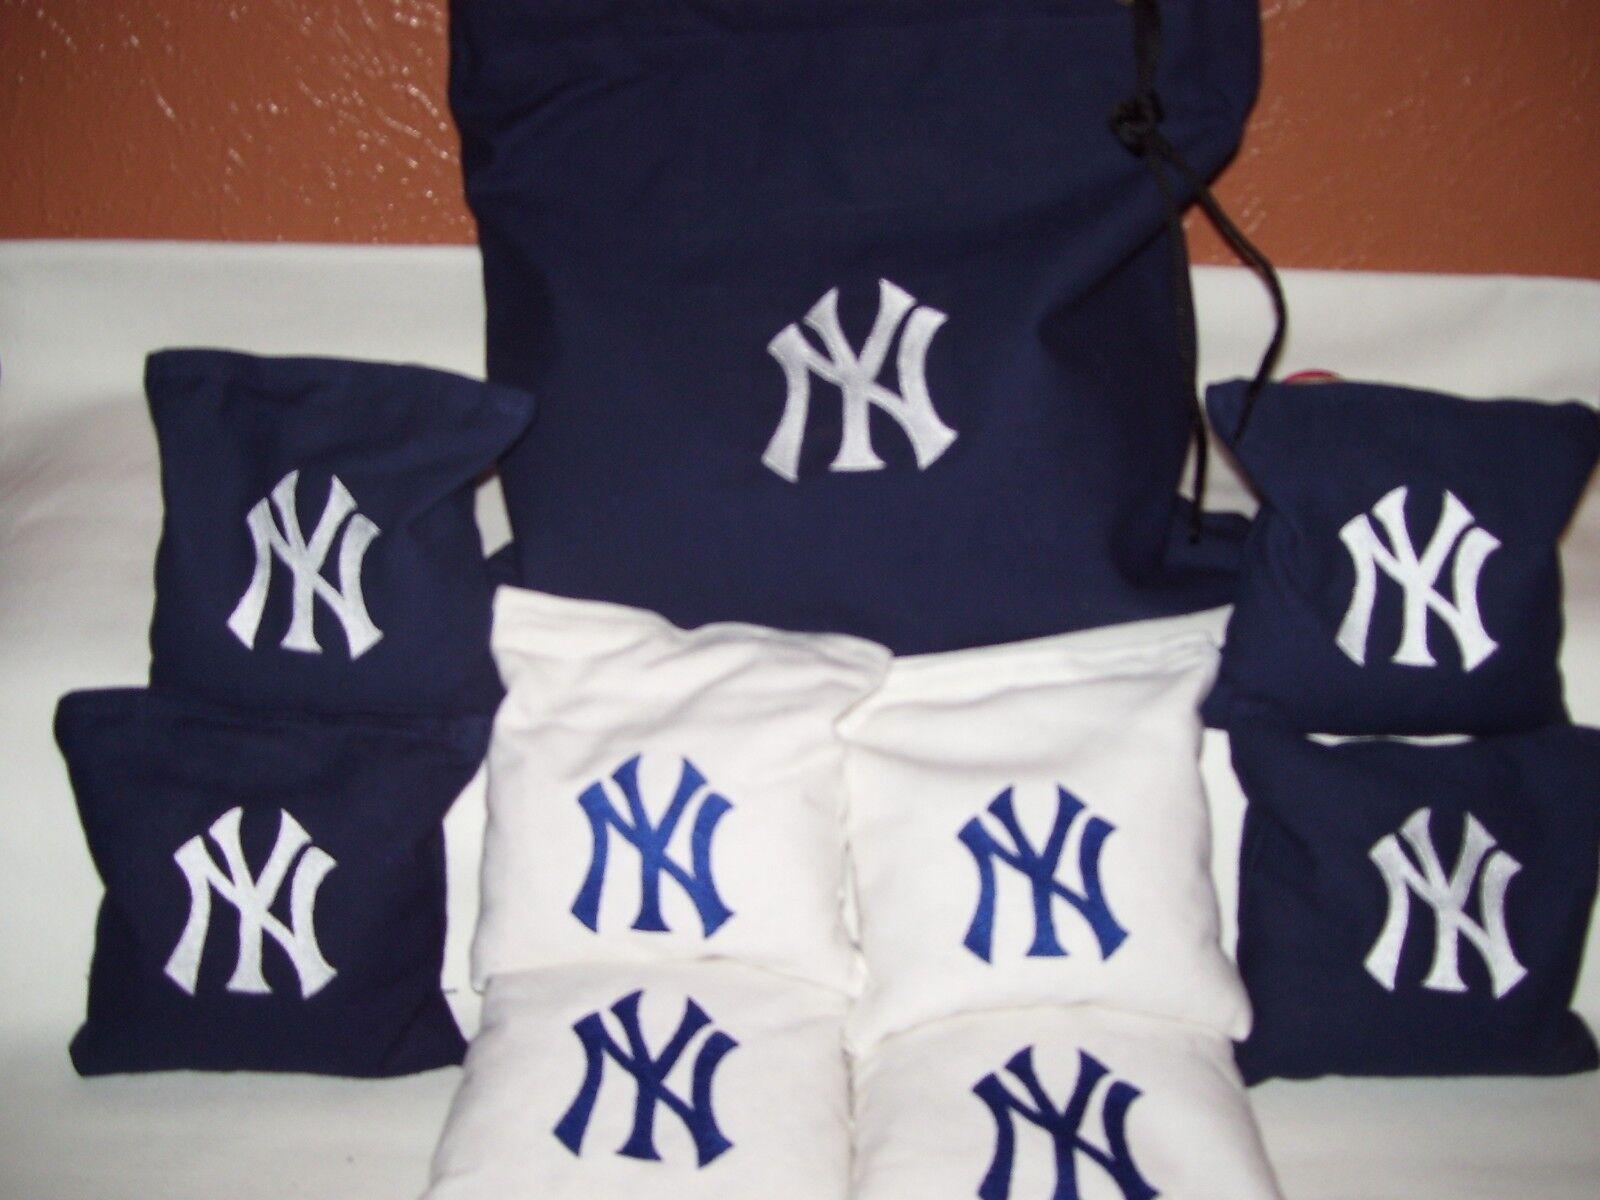 NY Yankees Embroidered Cornhole Corn Hole Bags Set of 8 with Storage Bag